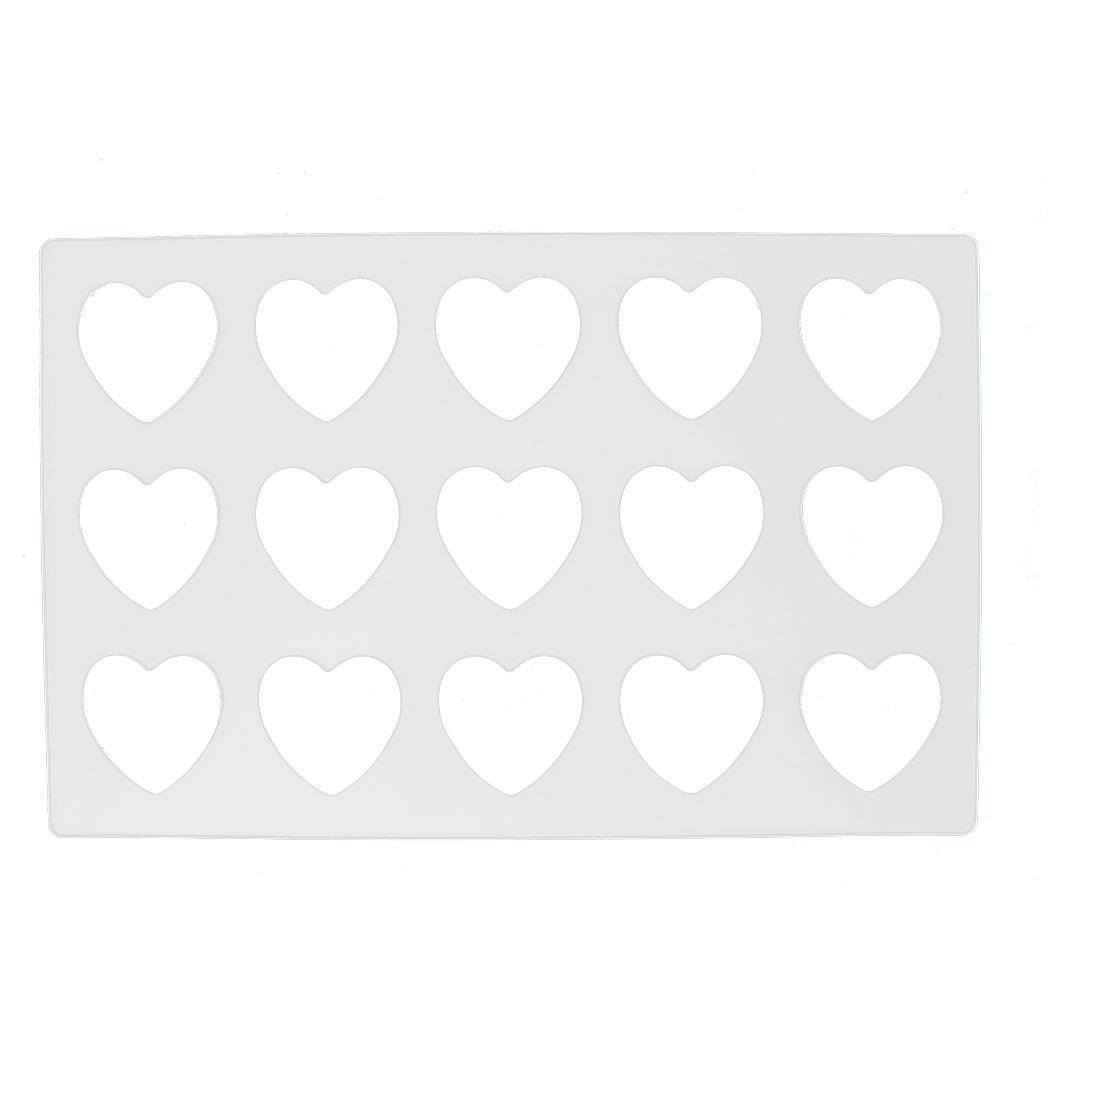 Household Heart Shape Design Part Cake Chocolate Mould